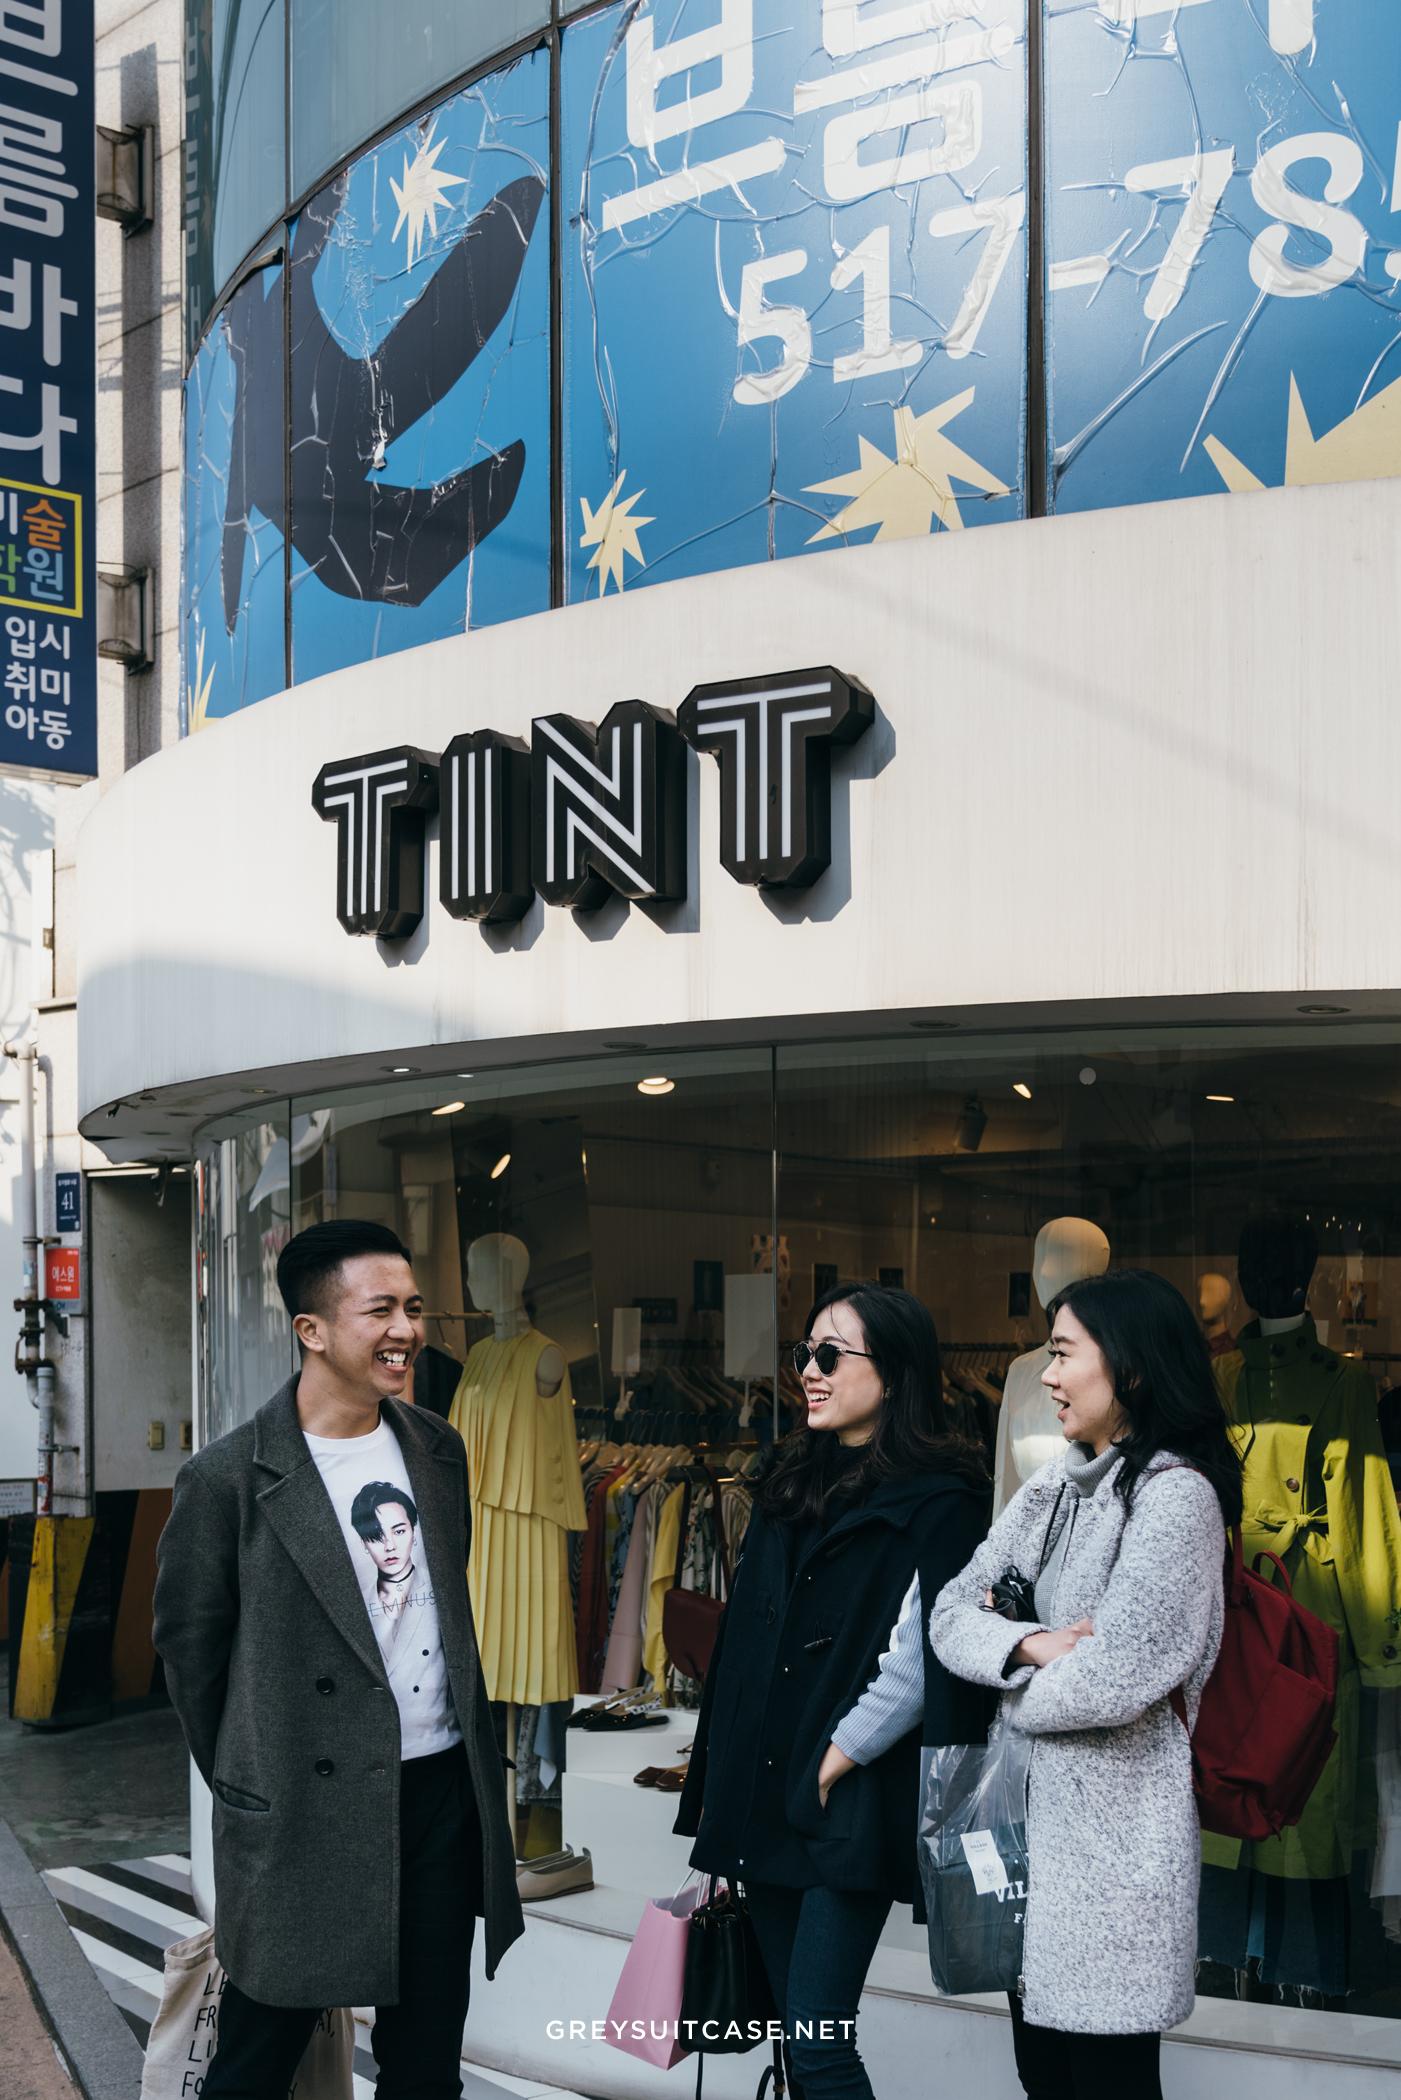 Greysuitcase Travel Series - Seoul Spring '17 - Garosugil (가로수길), Seoul, South Korea